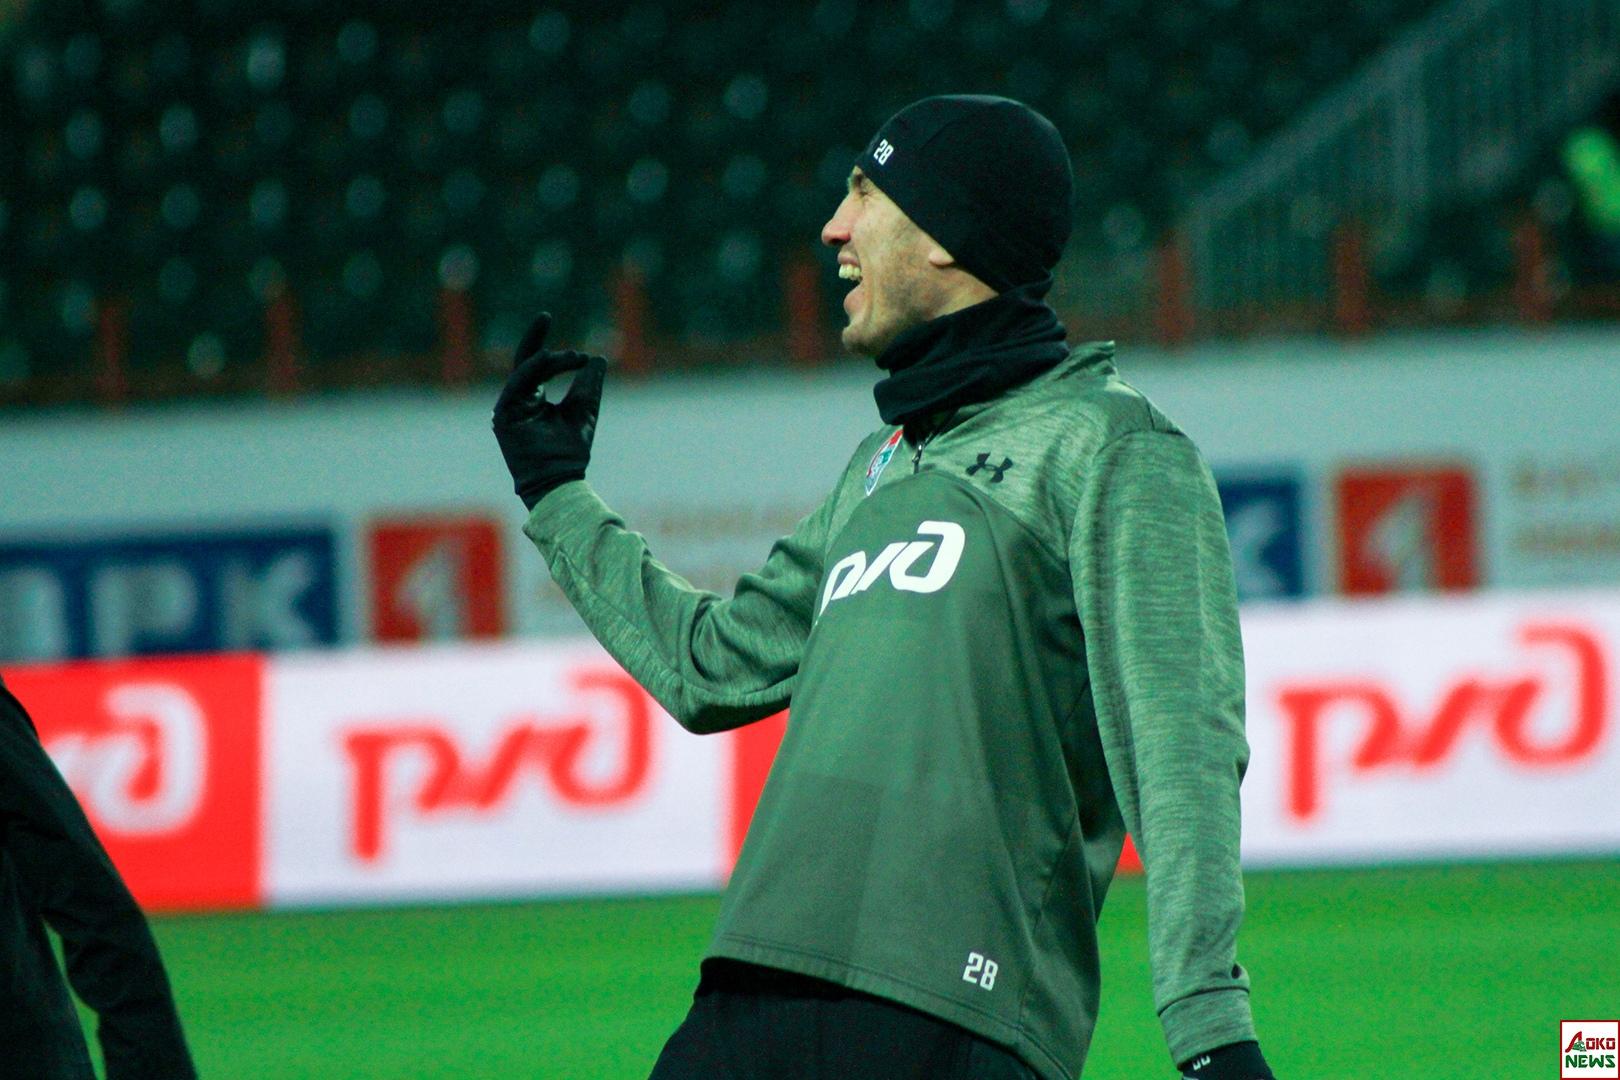 Борис Ротенберг. Фото: Дмитрий Бурдонов / Loko.News